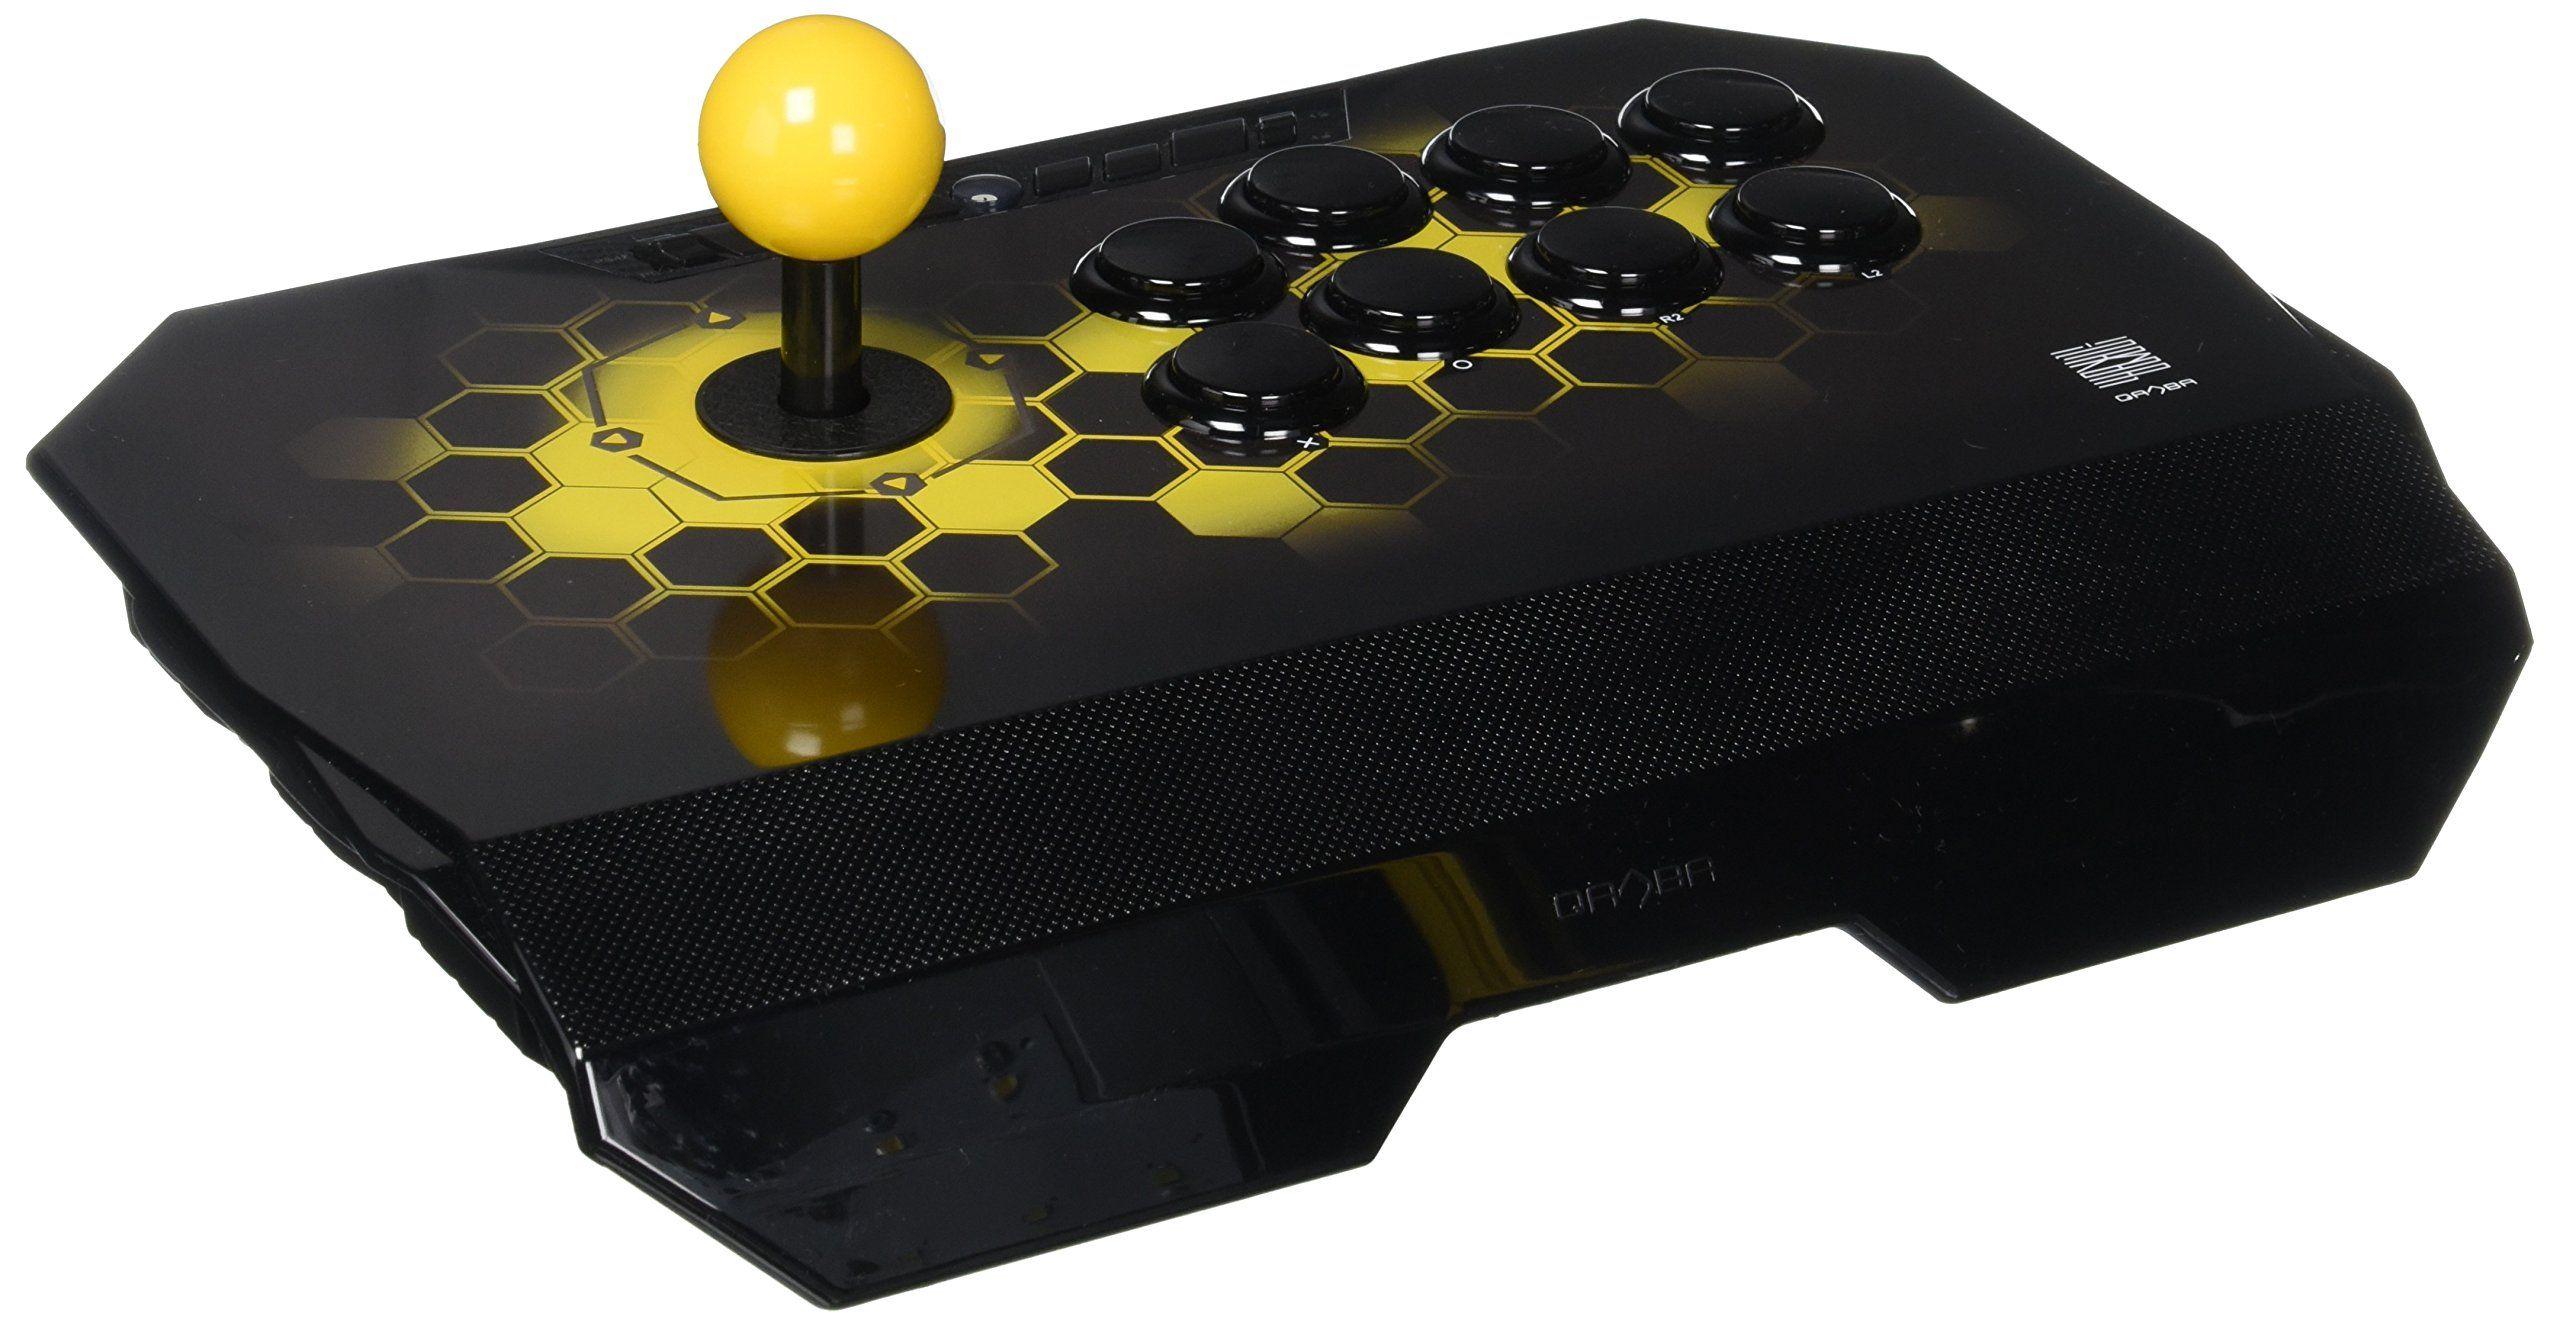 Qanba Drone PlayStation 4,Qanba, Drone, PlayStation